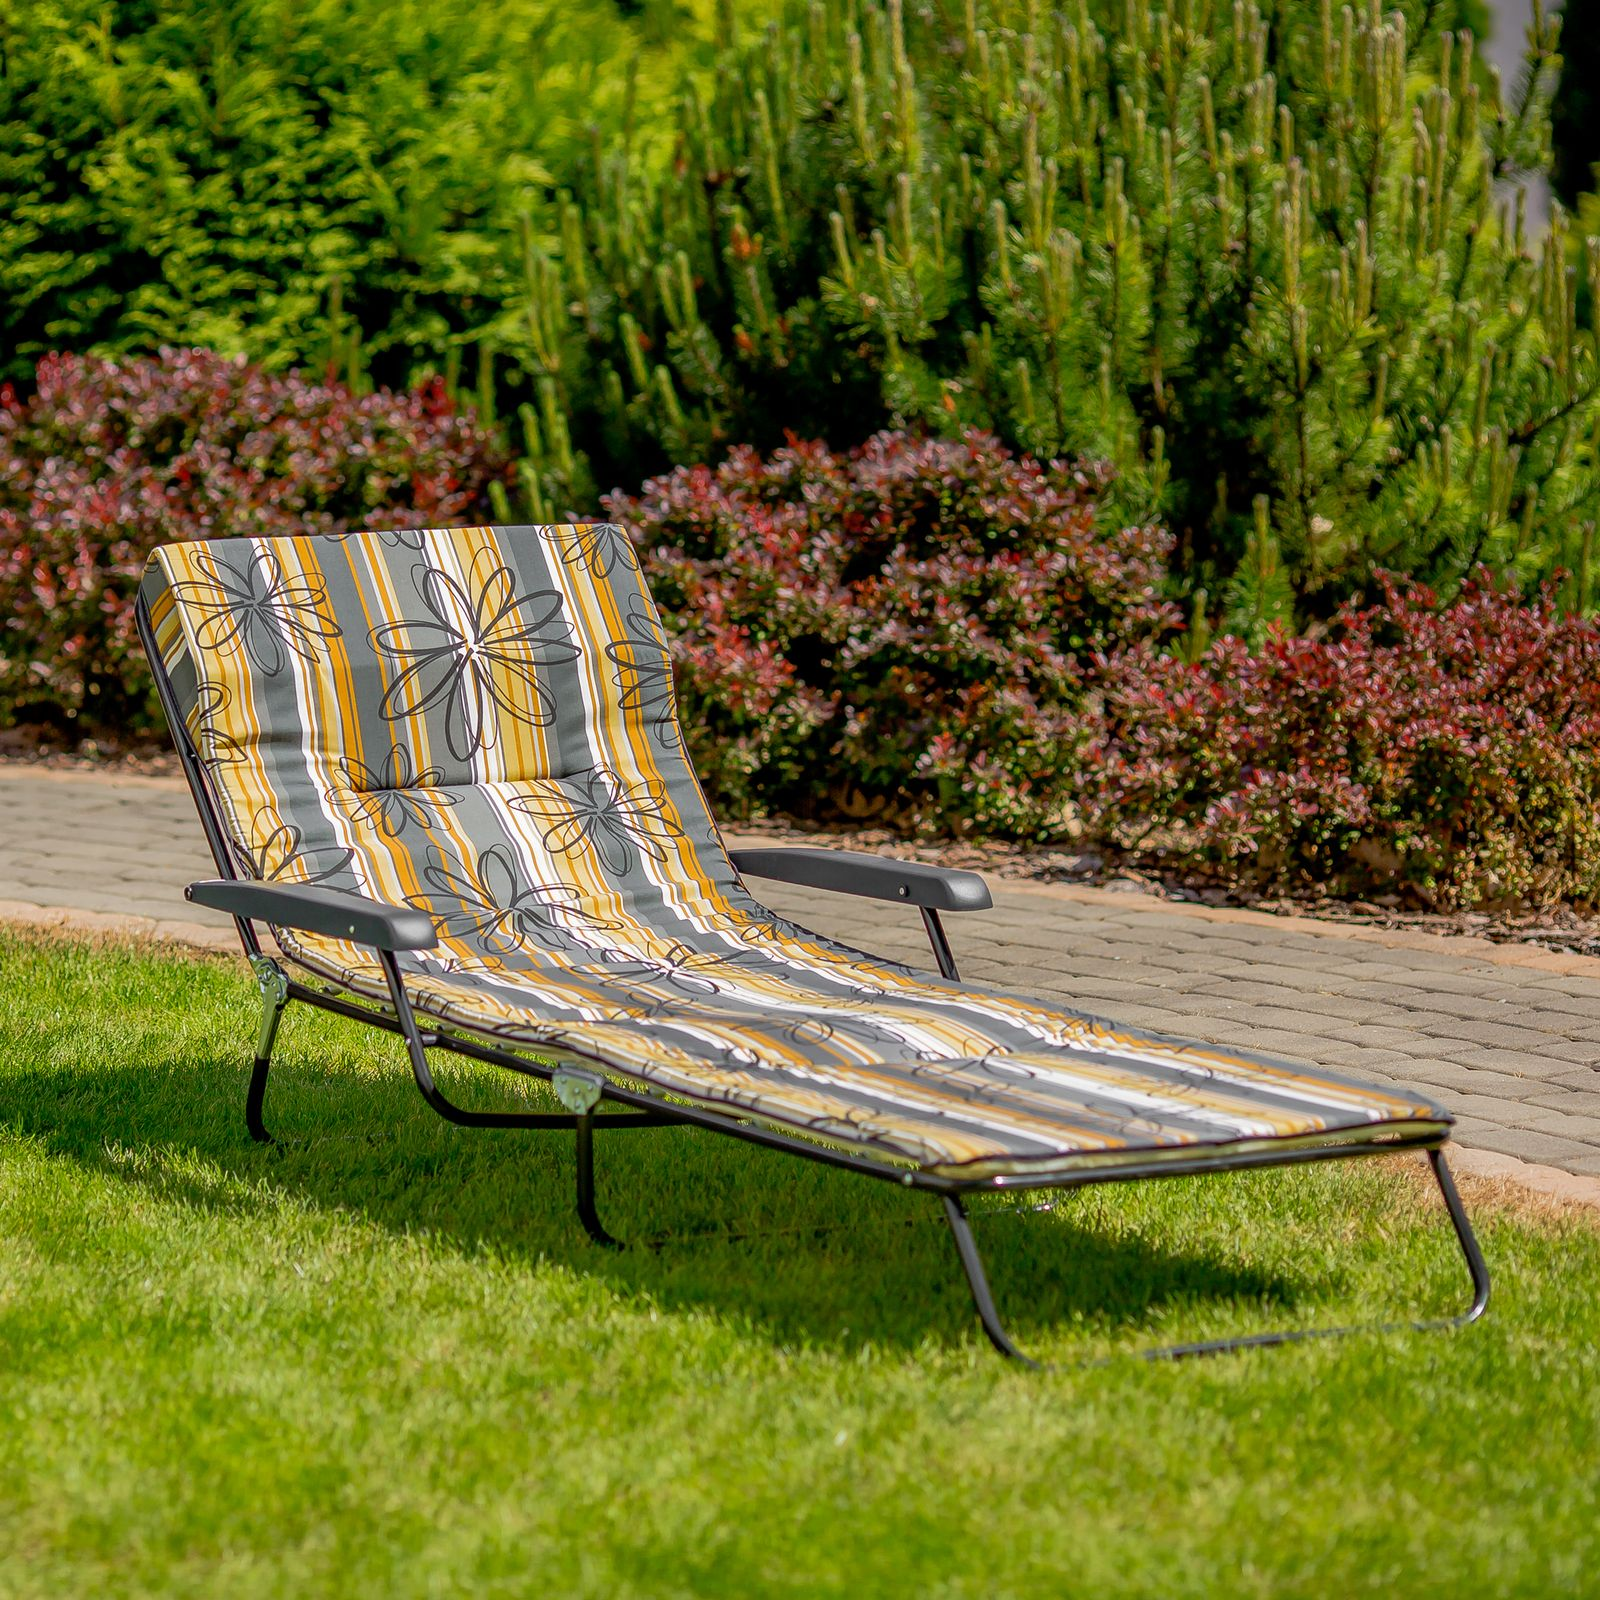 Łóżko ogrodowe Torino C037-16PB PATIO